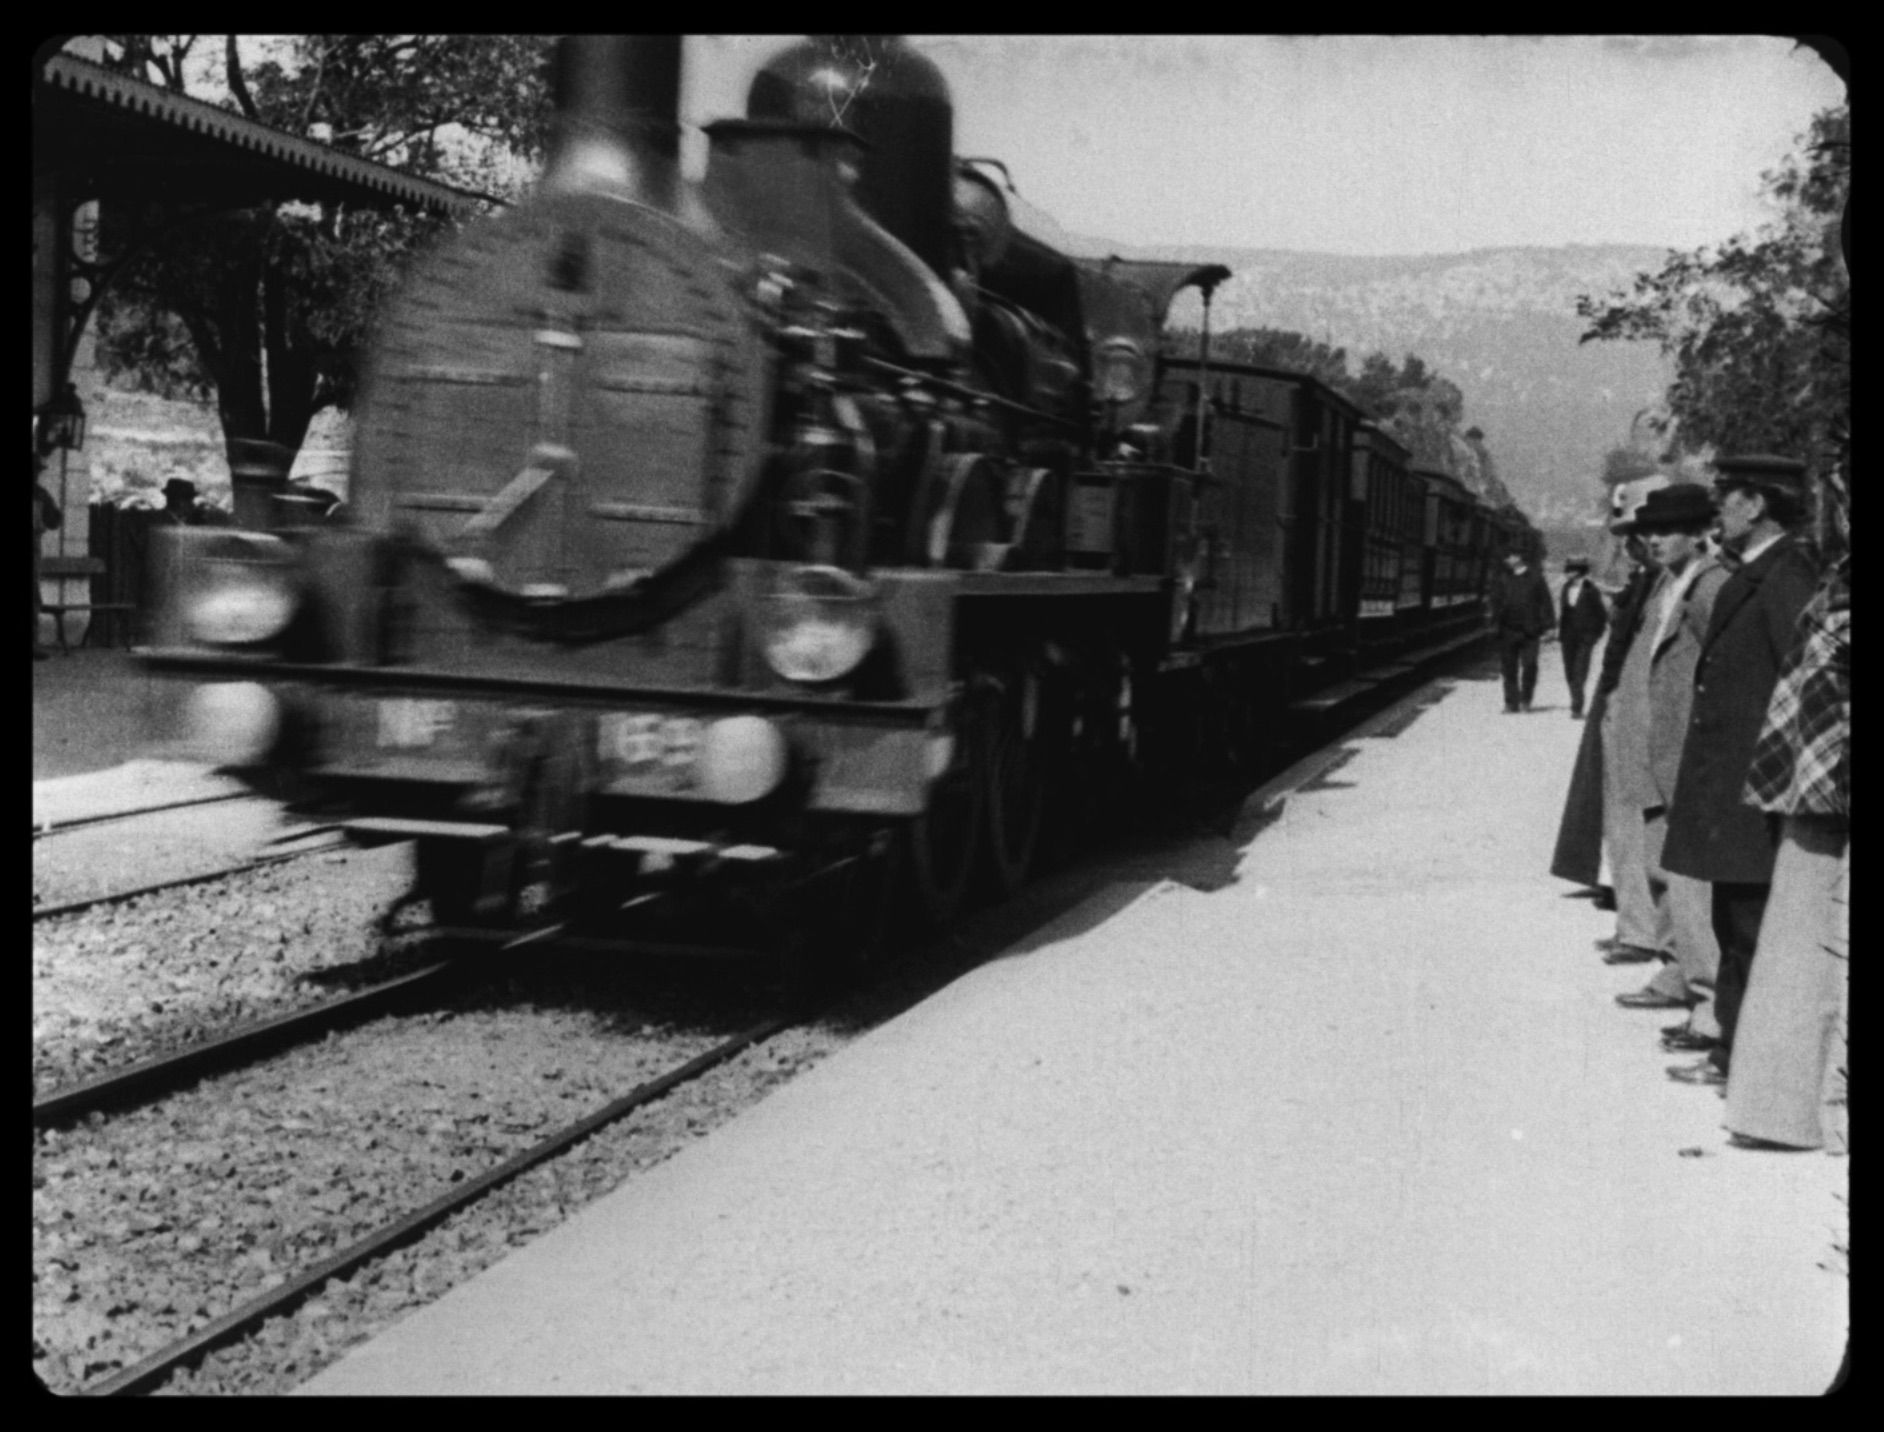 Lumiere, la llegada del tren a la ciudad